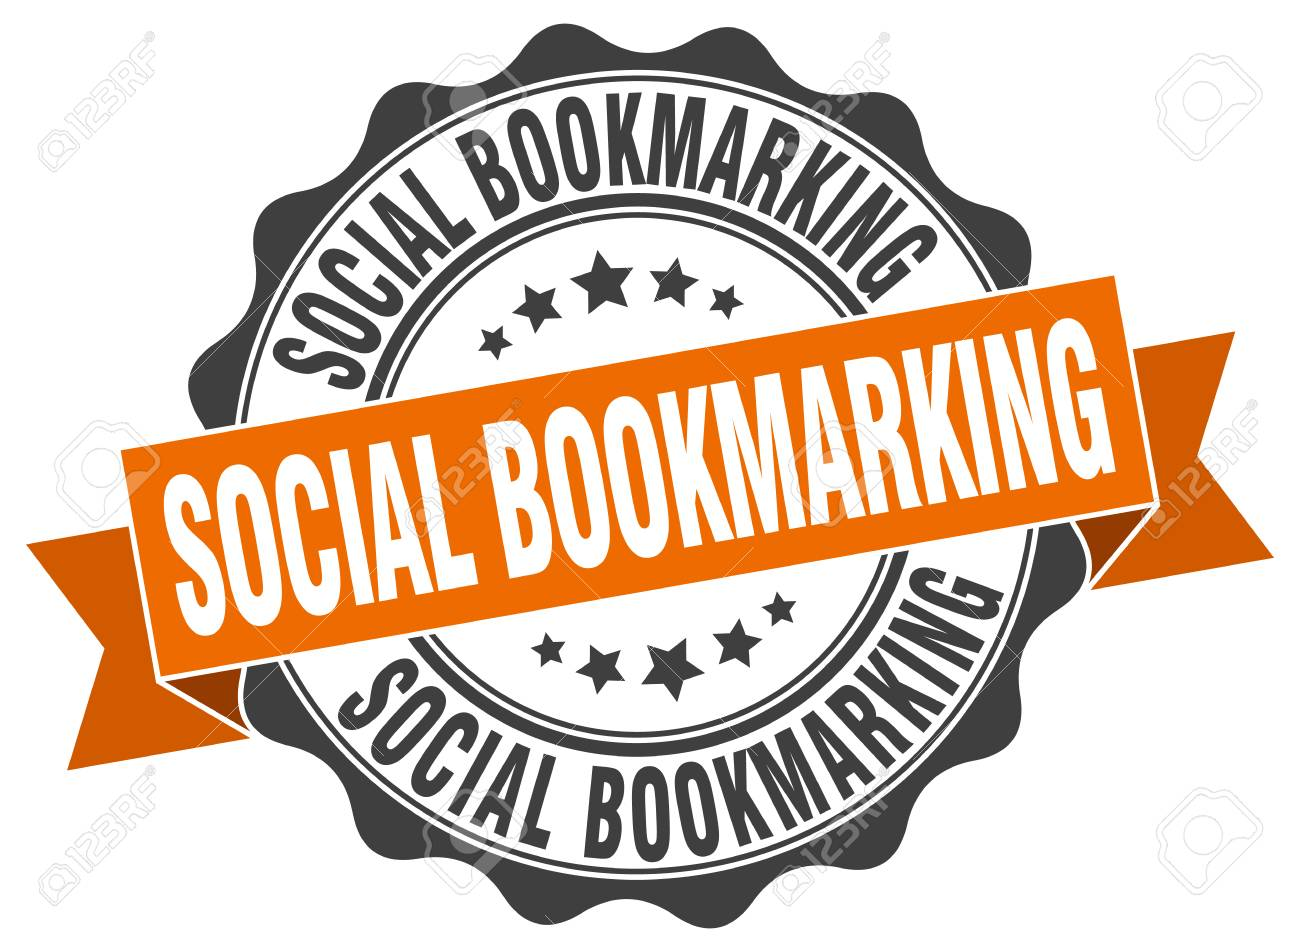 Social Bookmarking Stamp. Sign. Seal Sto-social bookmarking stamp. sign. seal Stock Vector - 67898162-17